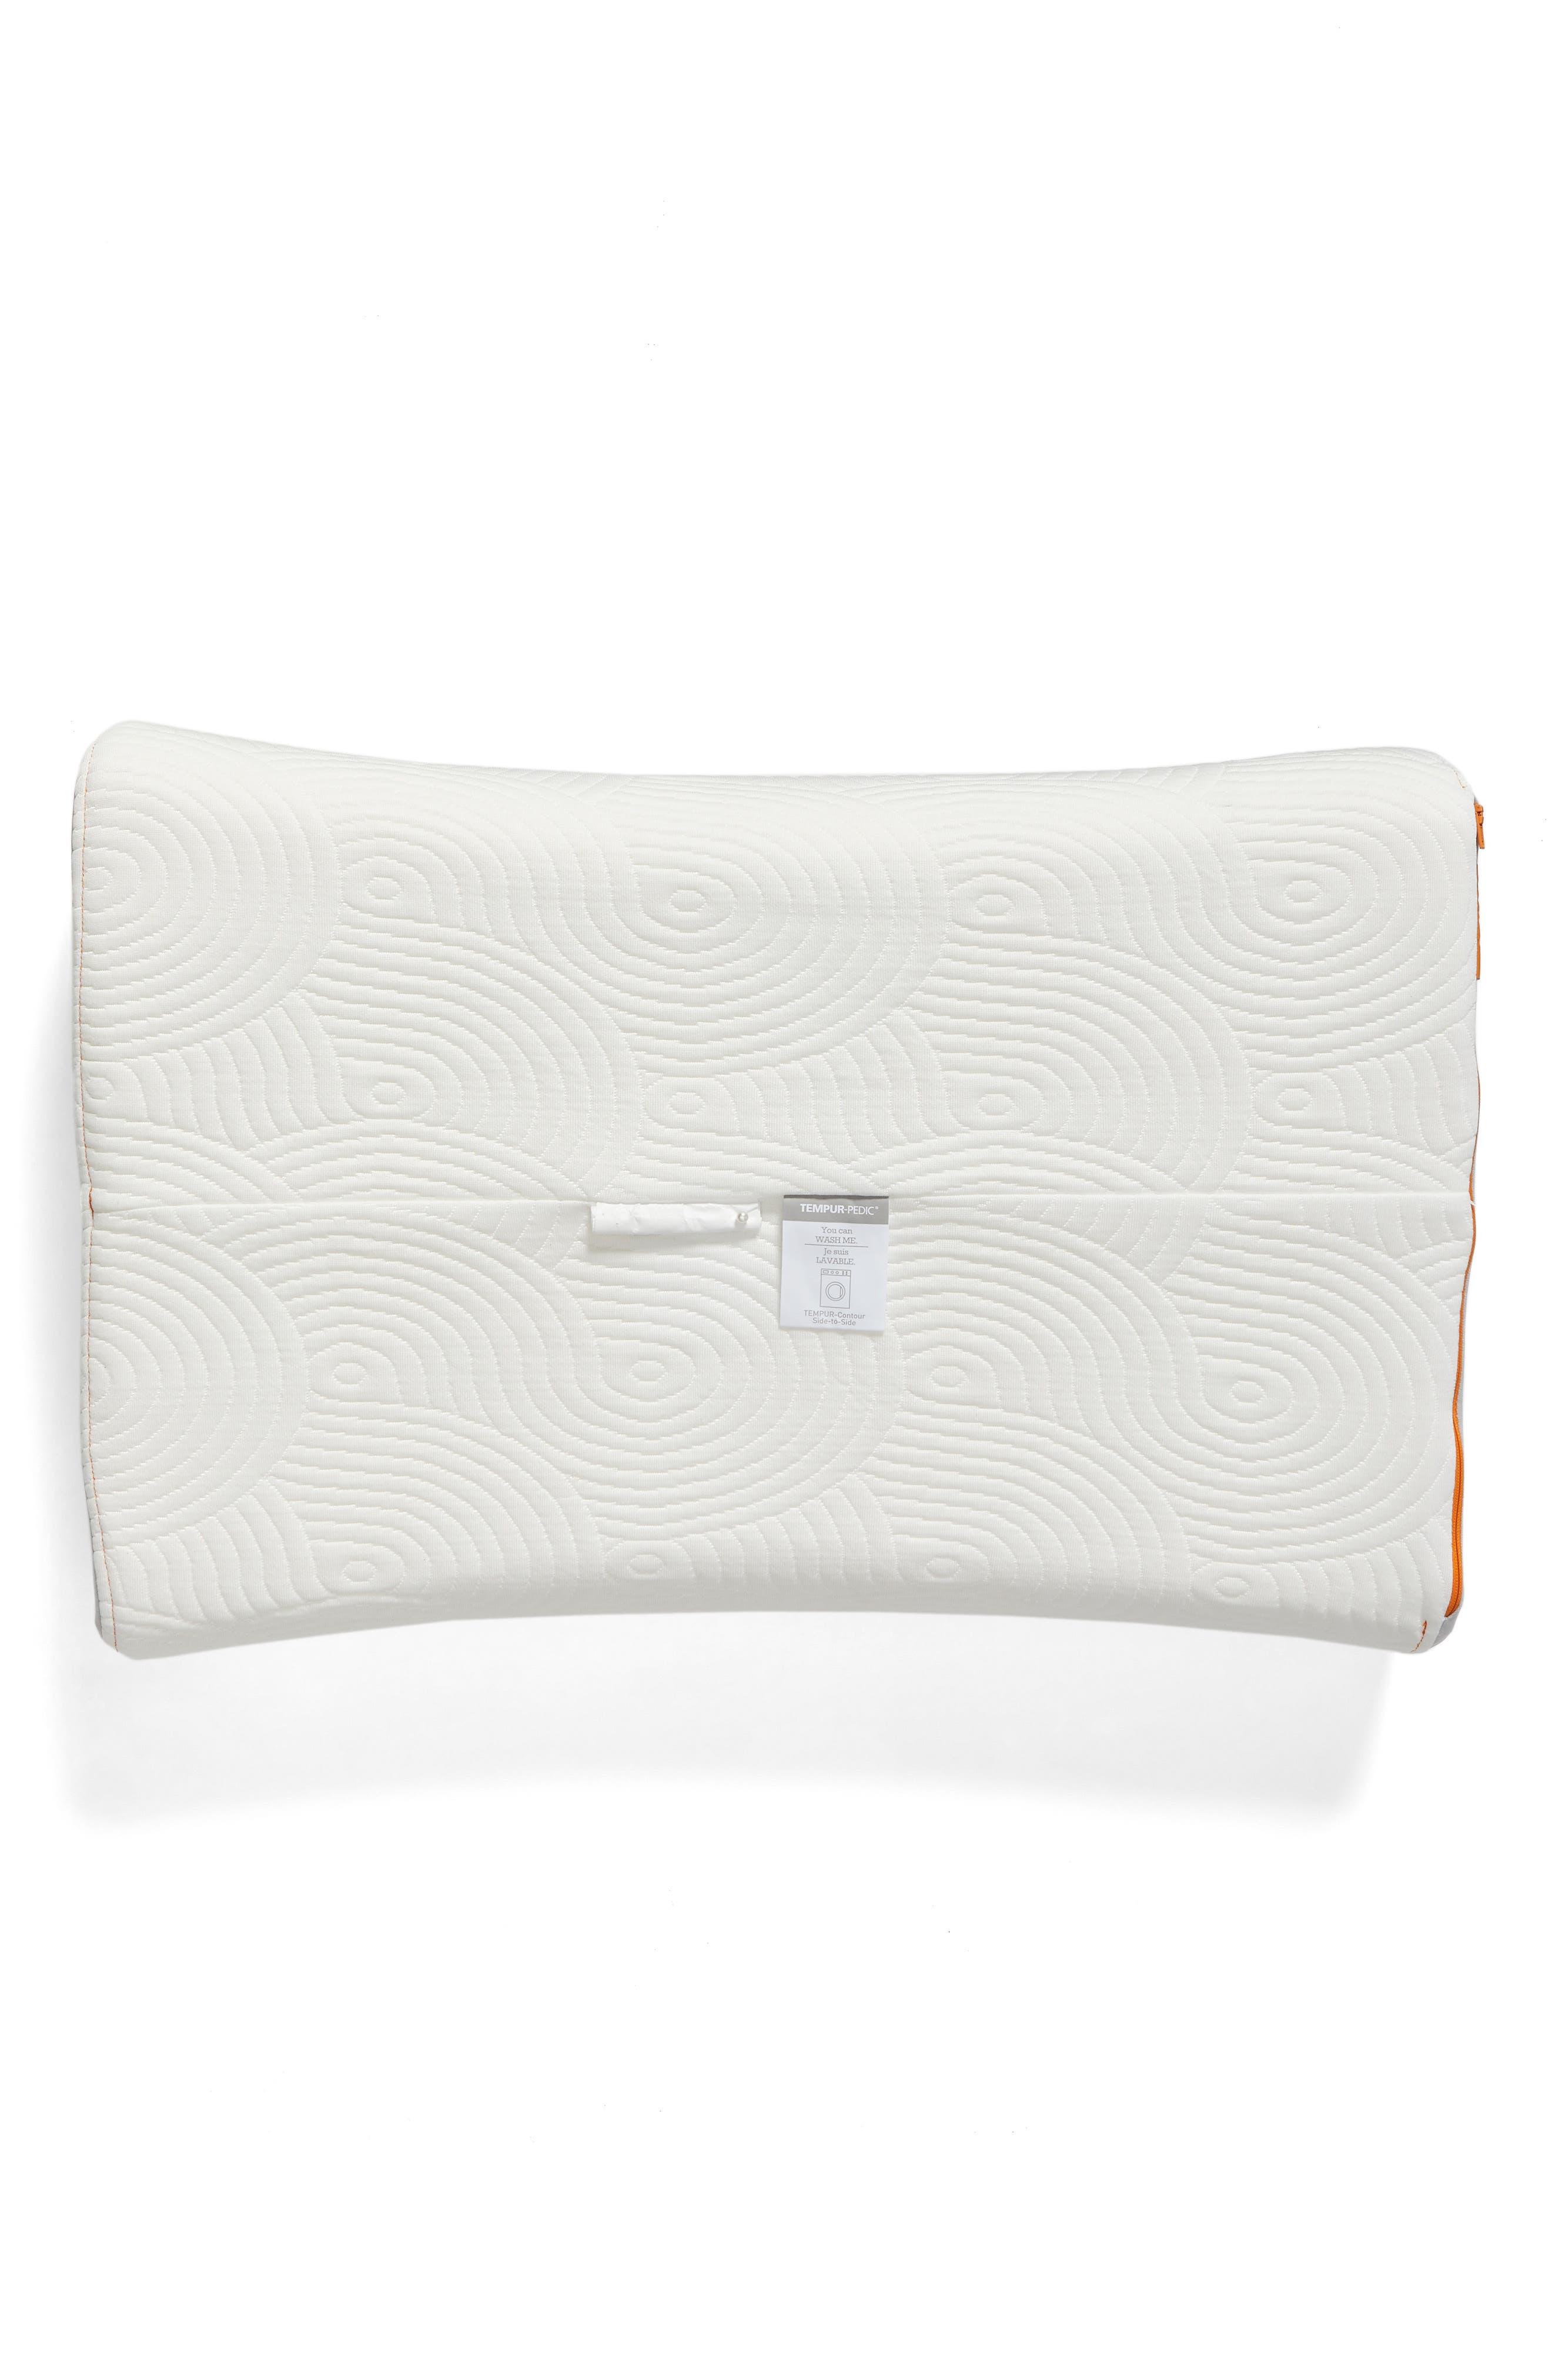 TEMPUR-Contour Side-to-Side Pillow,                             Alternate thumbnail 3, color,                             White